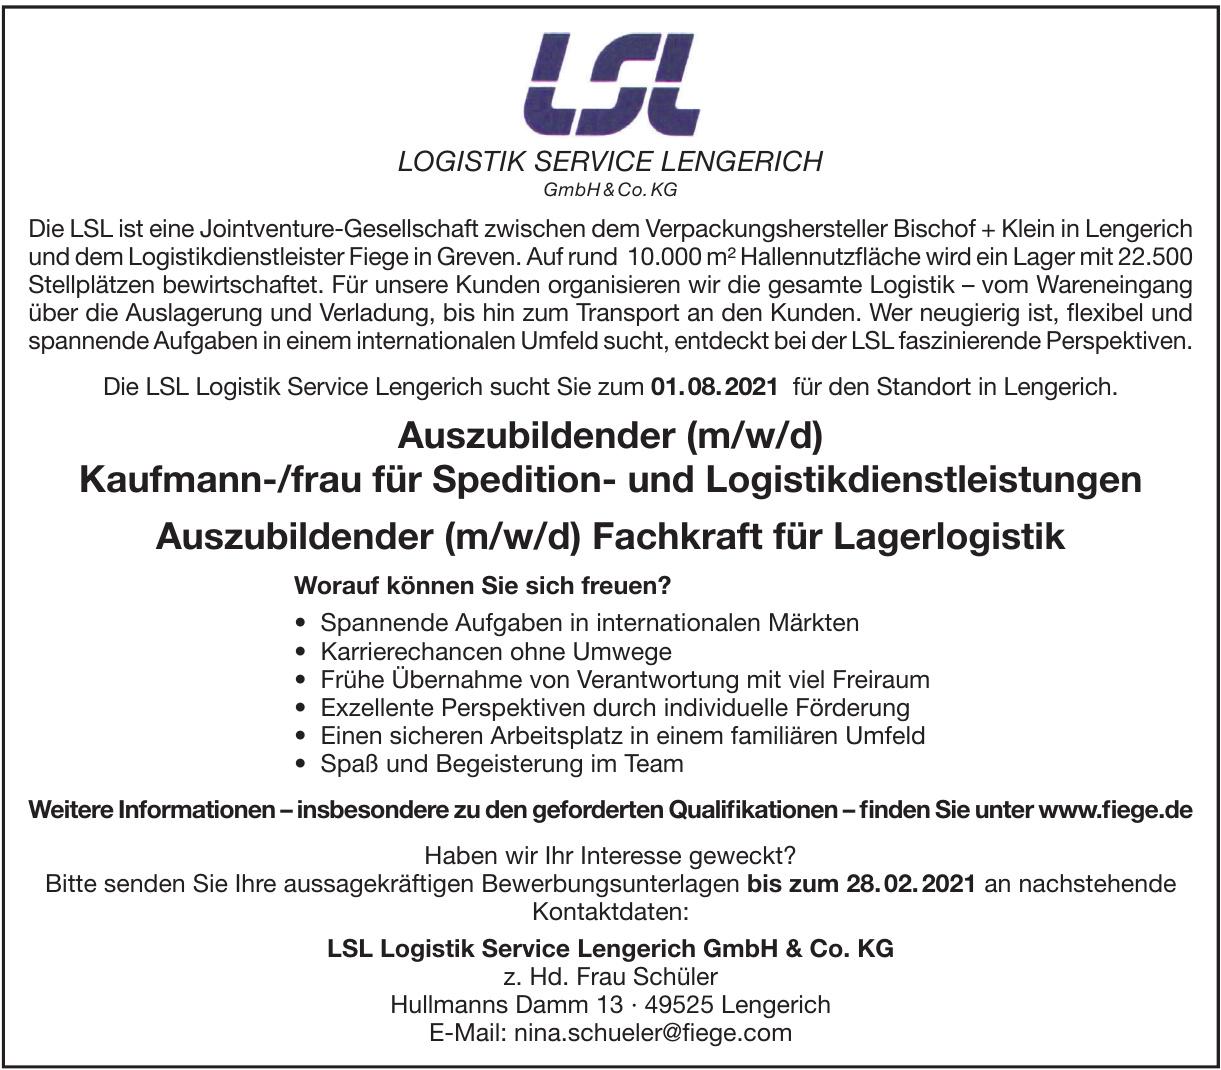 LSL Logistik Service Lengerich GmbH & Co. KG